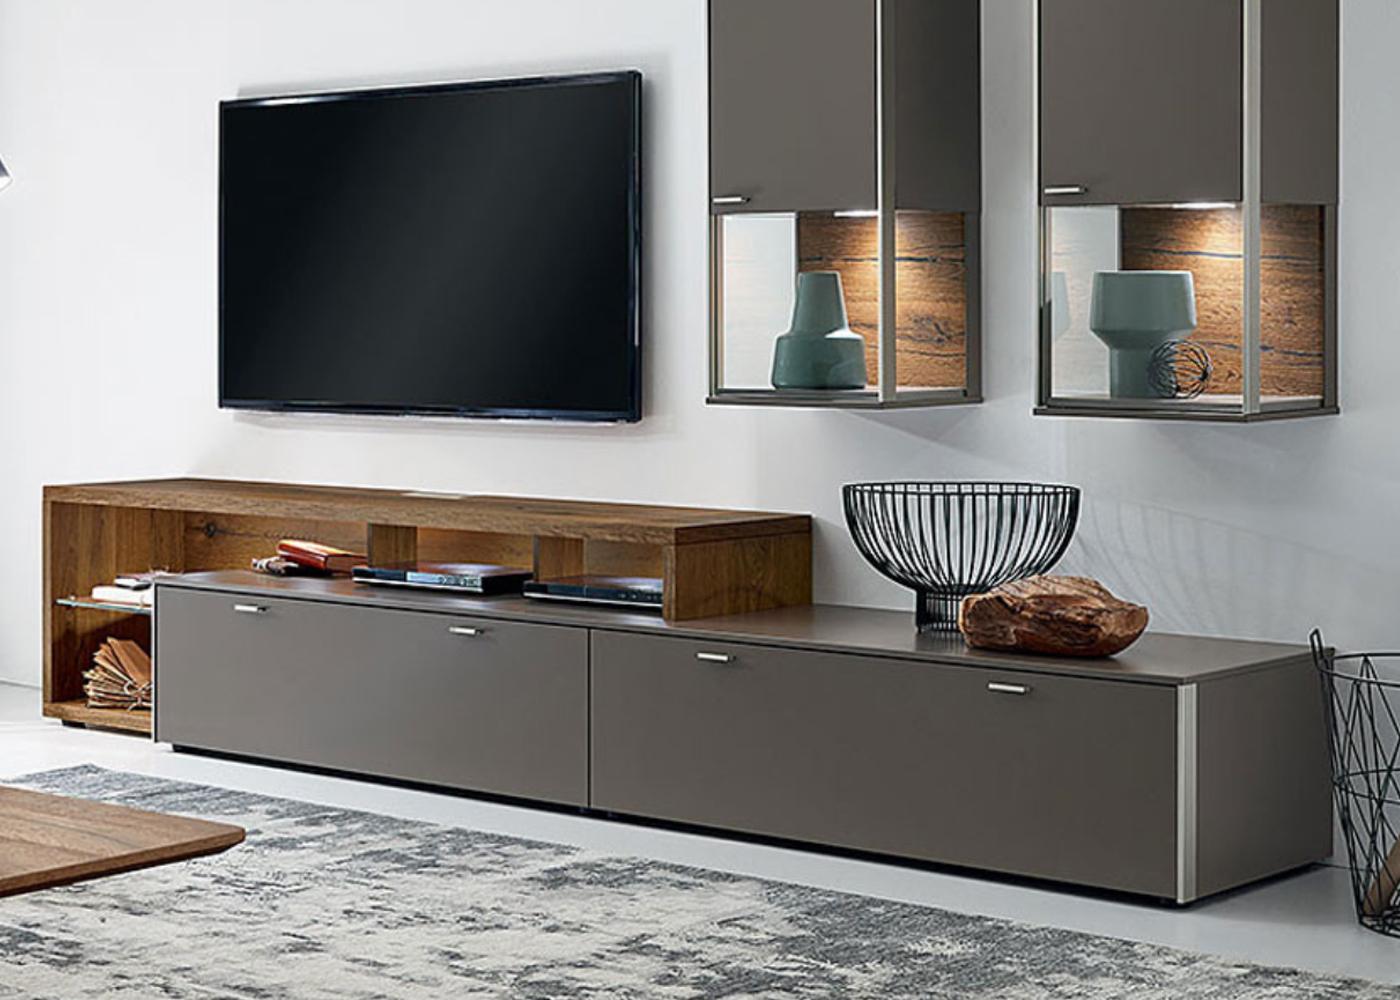 Venjakob Sentino Lowboard Midfurn Furniture Superstore